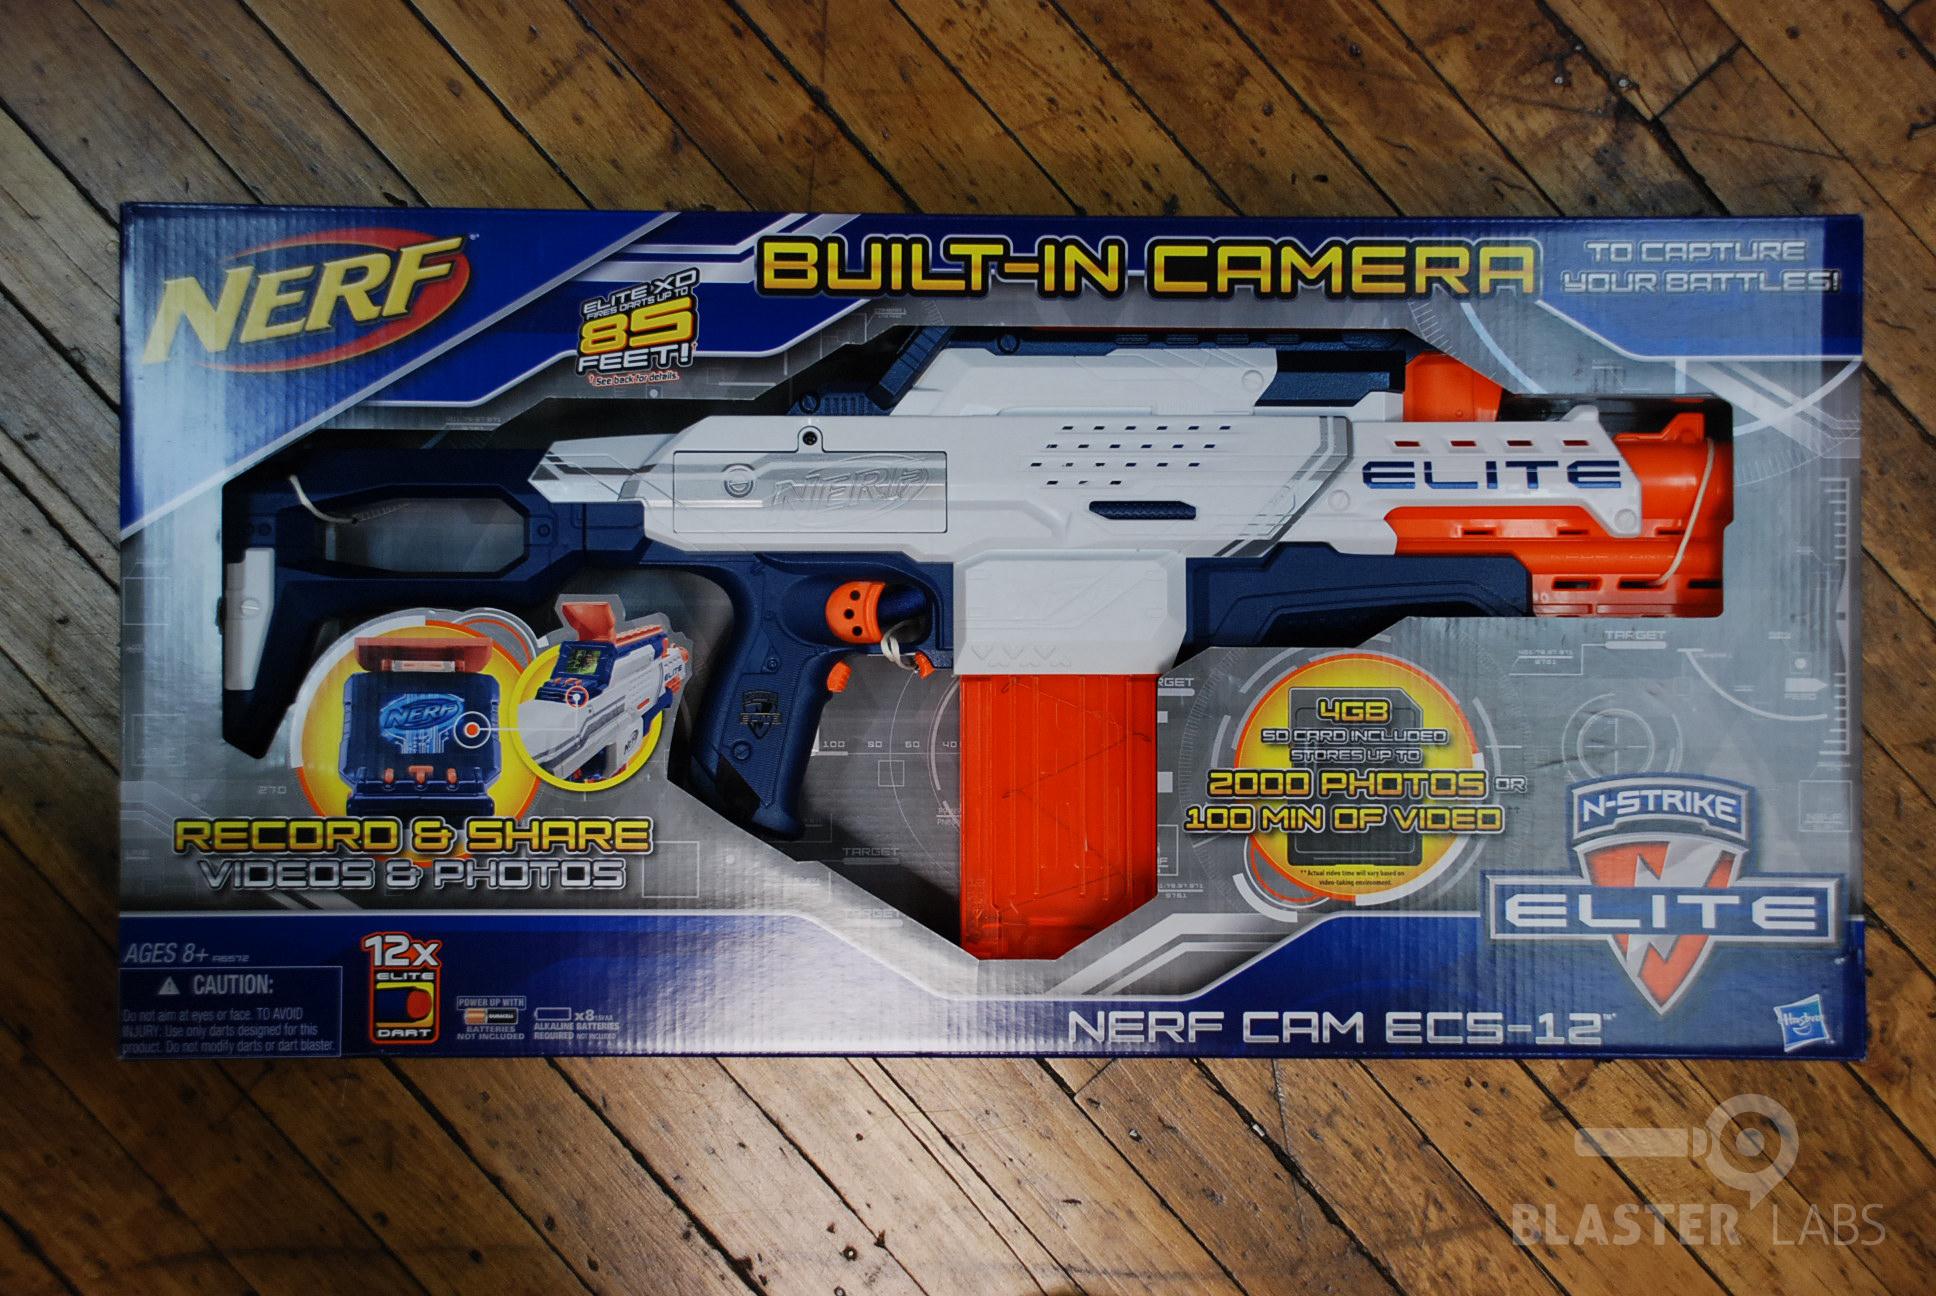 N Strike Elite Nerf Cam ECS 12 19